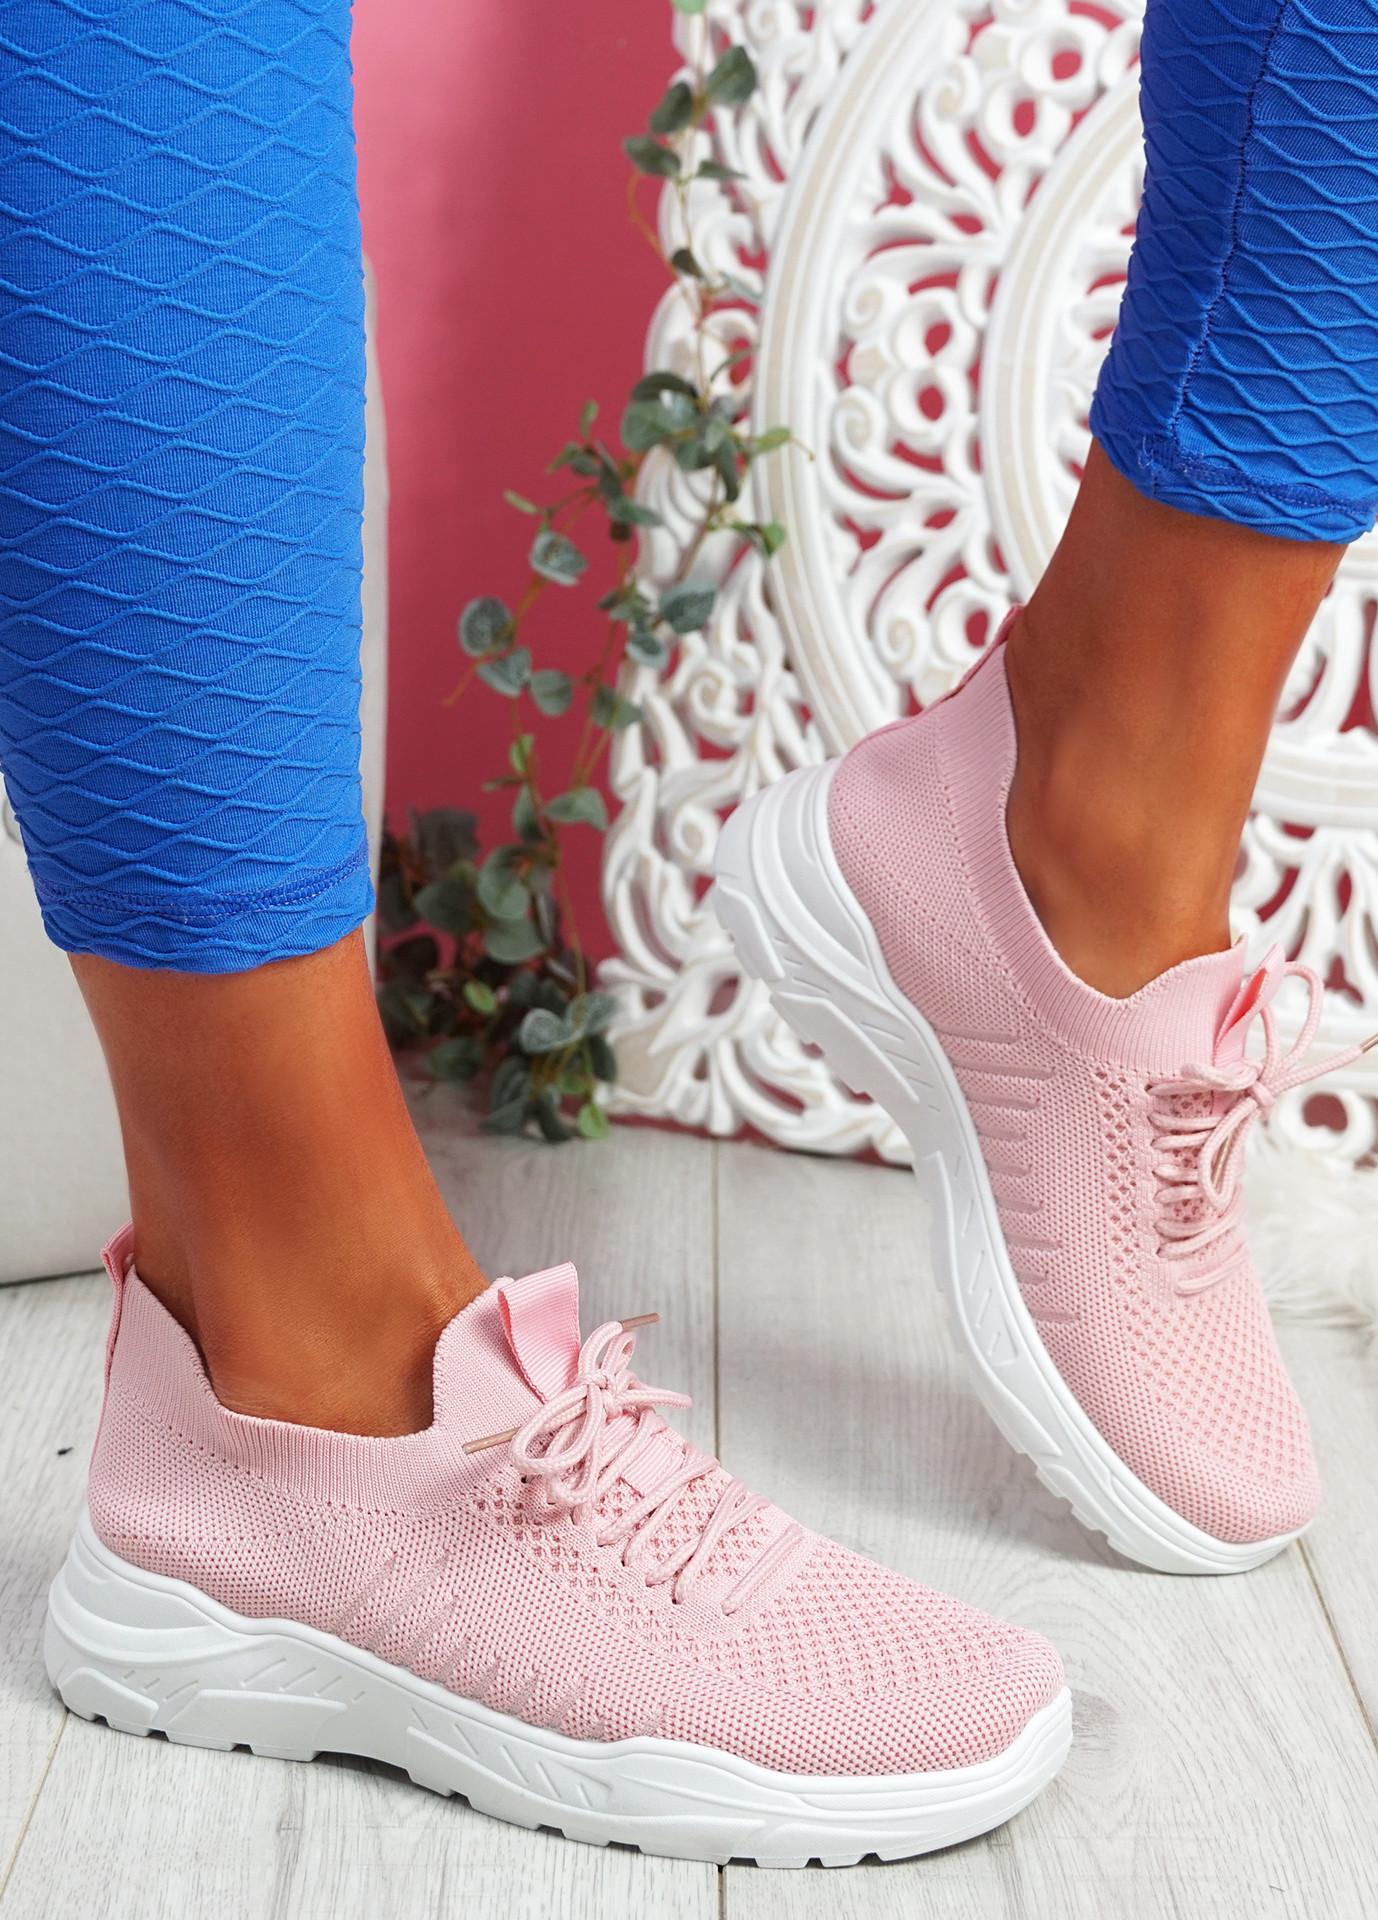 Koda Pink Knit Chunky Sneakers